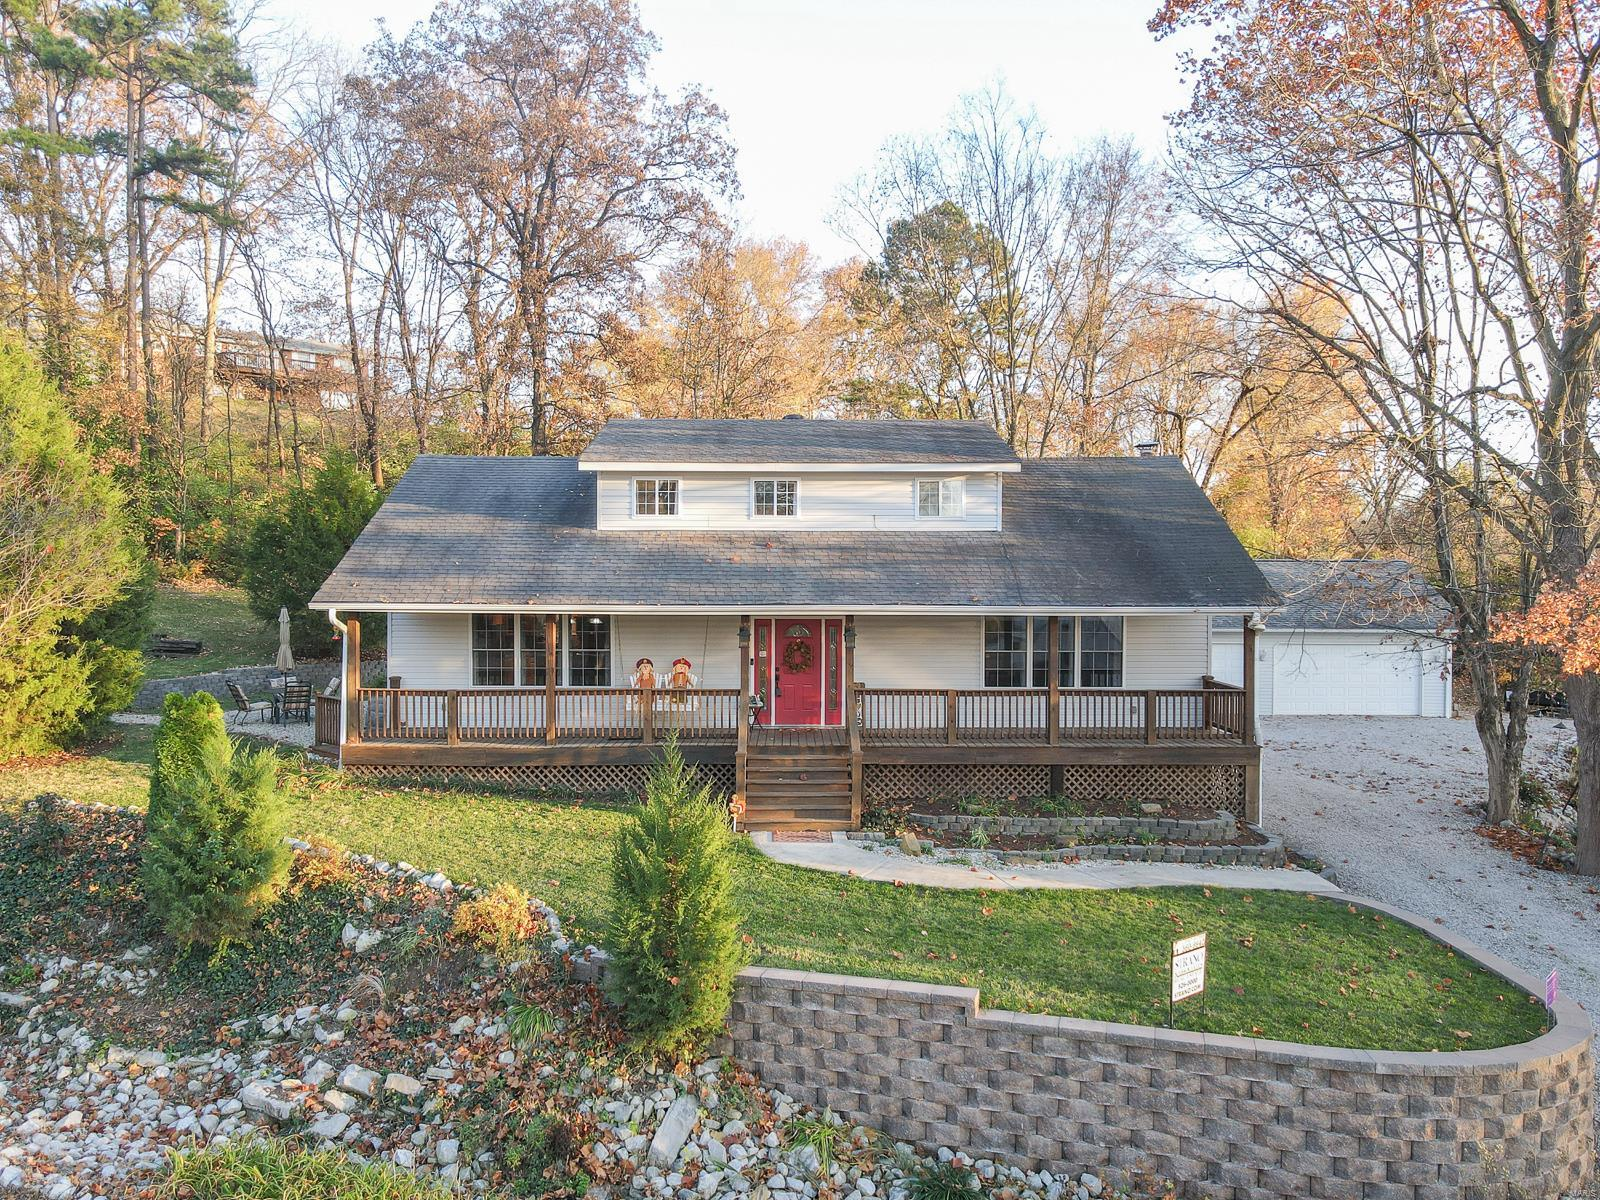 924 Sugarloaf Hill Property Photo - Dupo, IL real estate listing